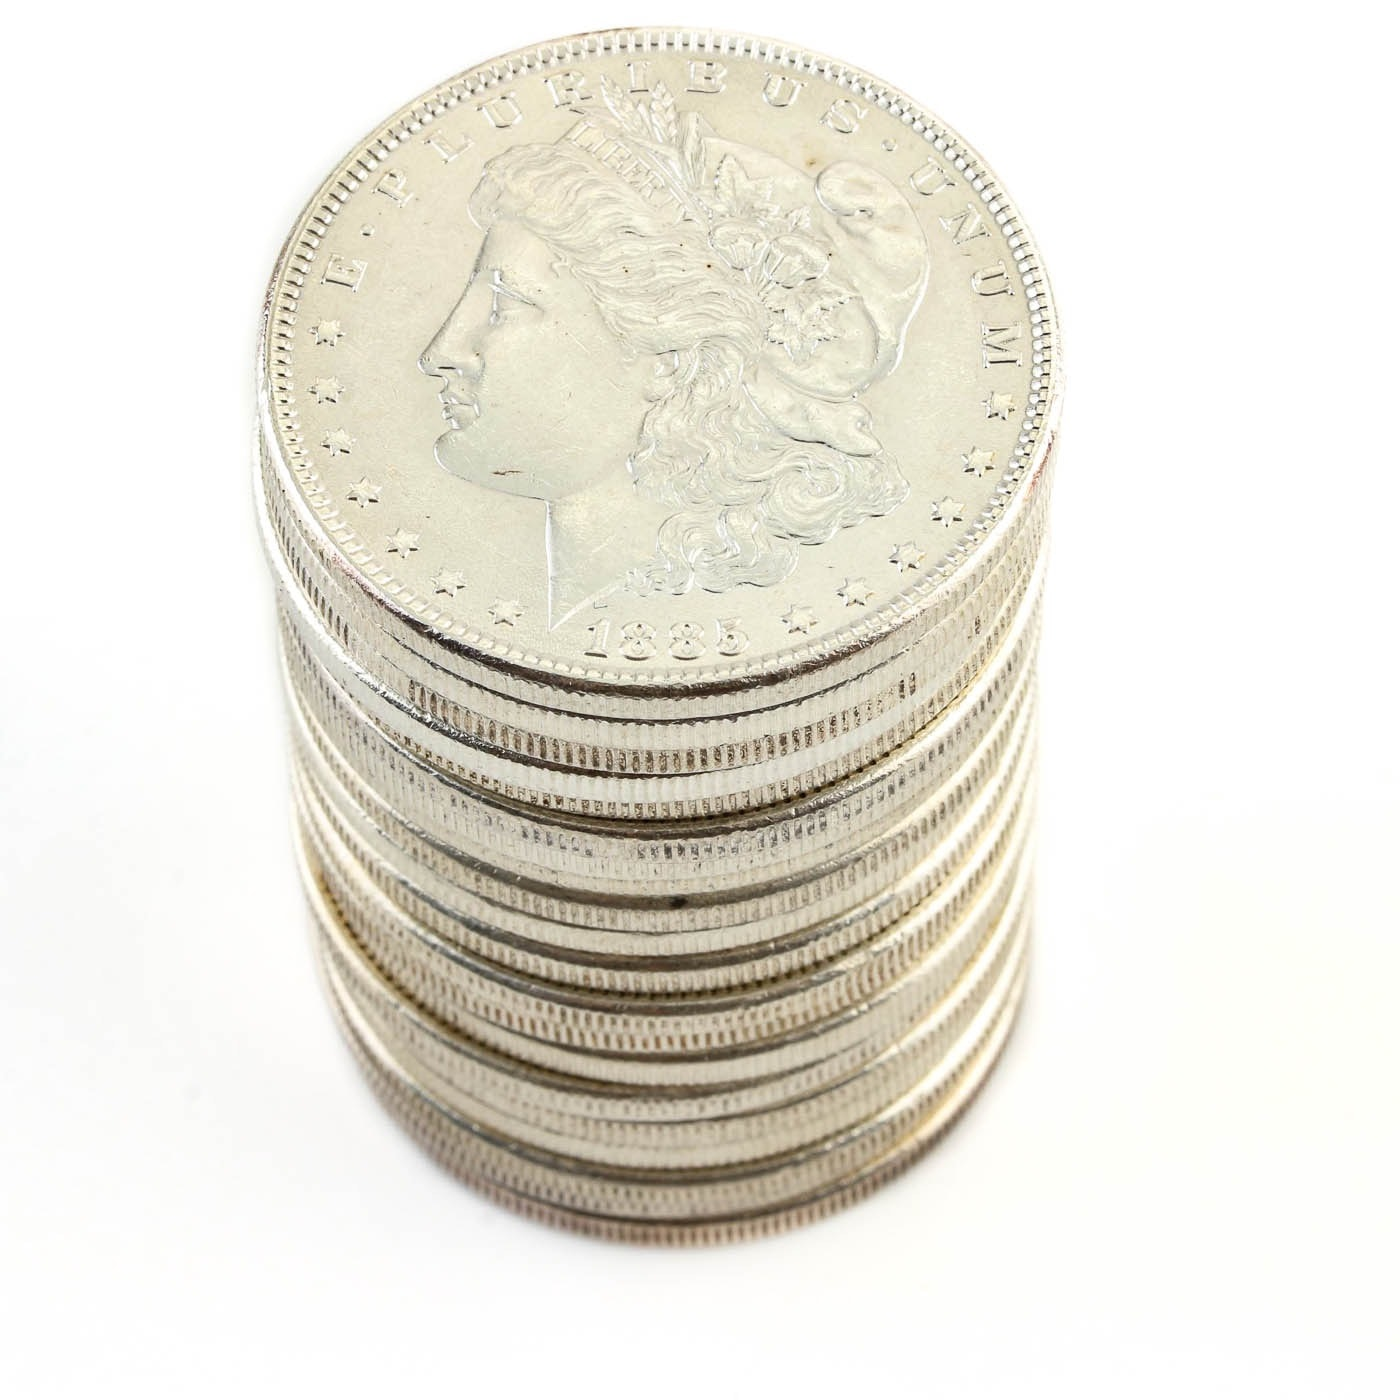 Group of Twenty Uncirculated 1885 Silver Morgan Dollars